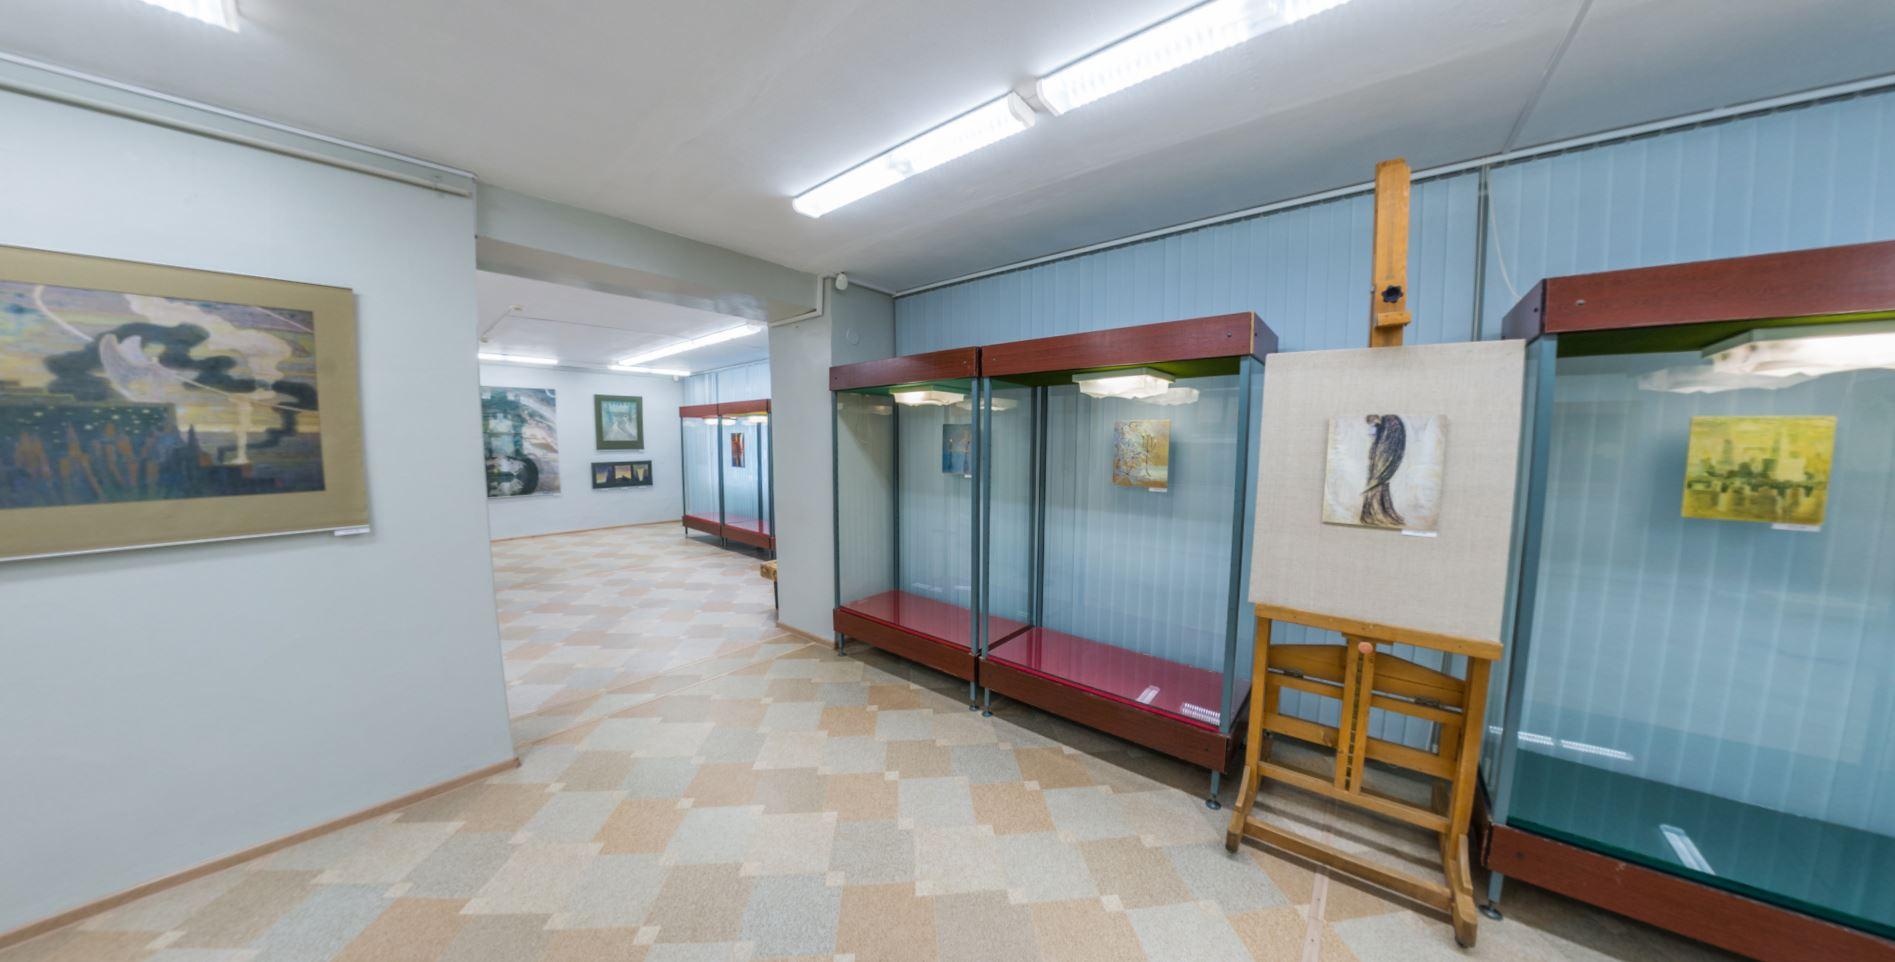 Юрга музей ИЗО